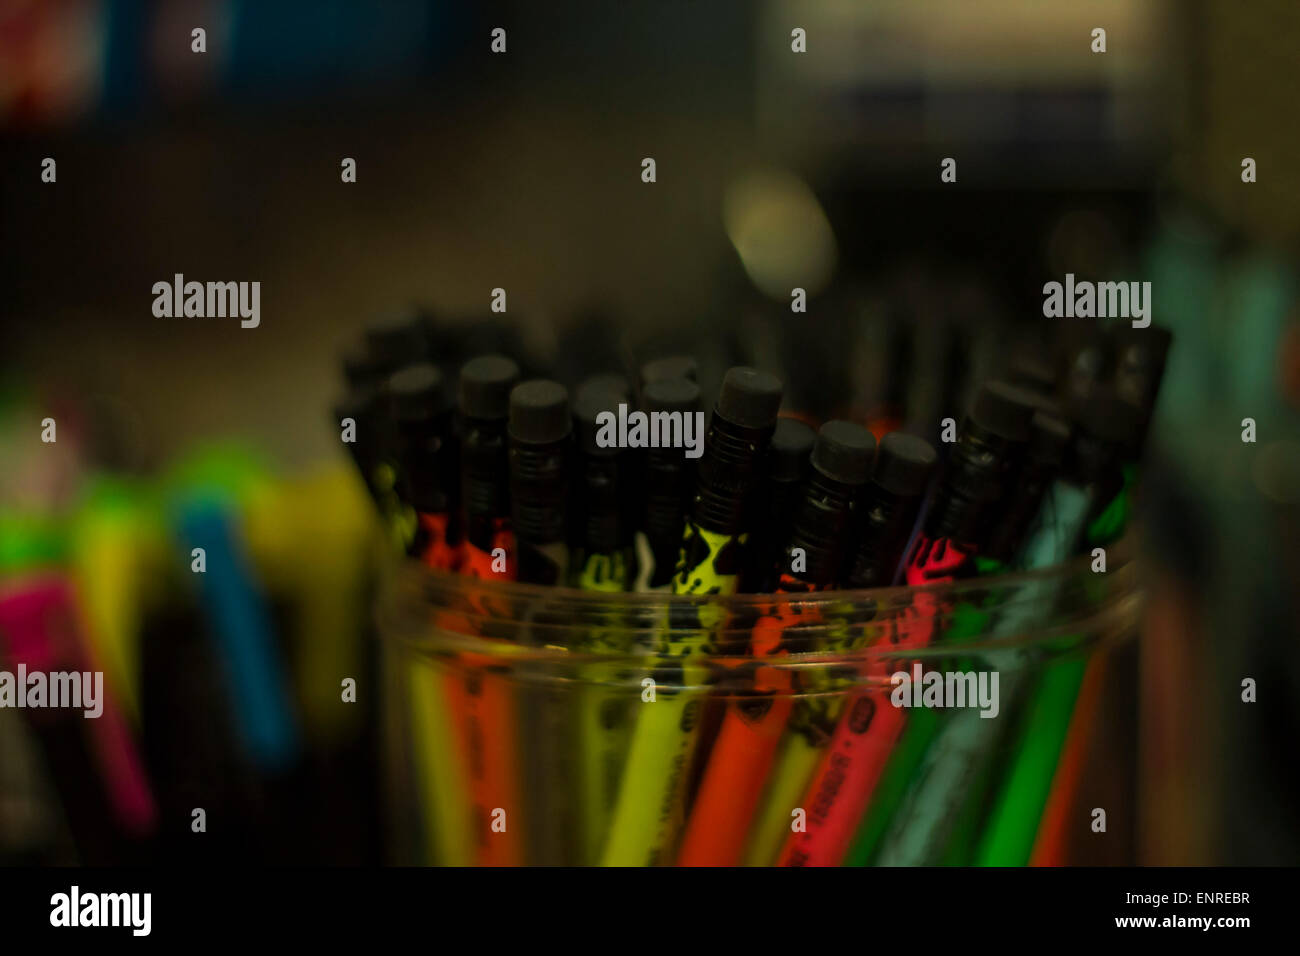 eraser top highlight pencil - Stock Image